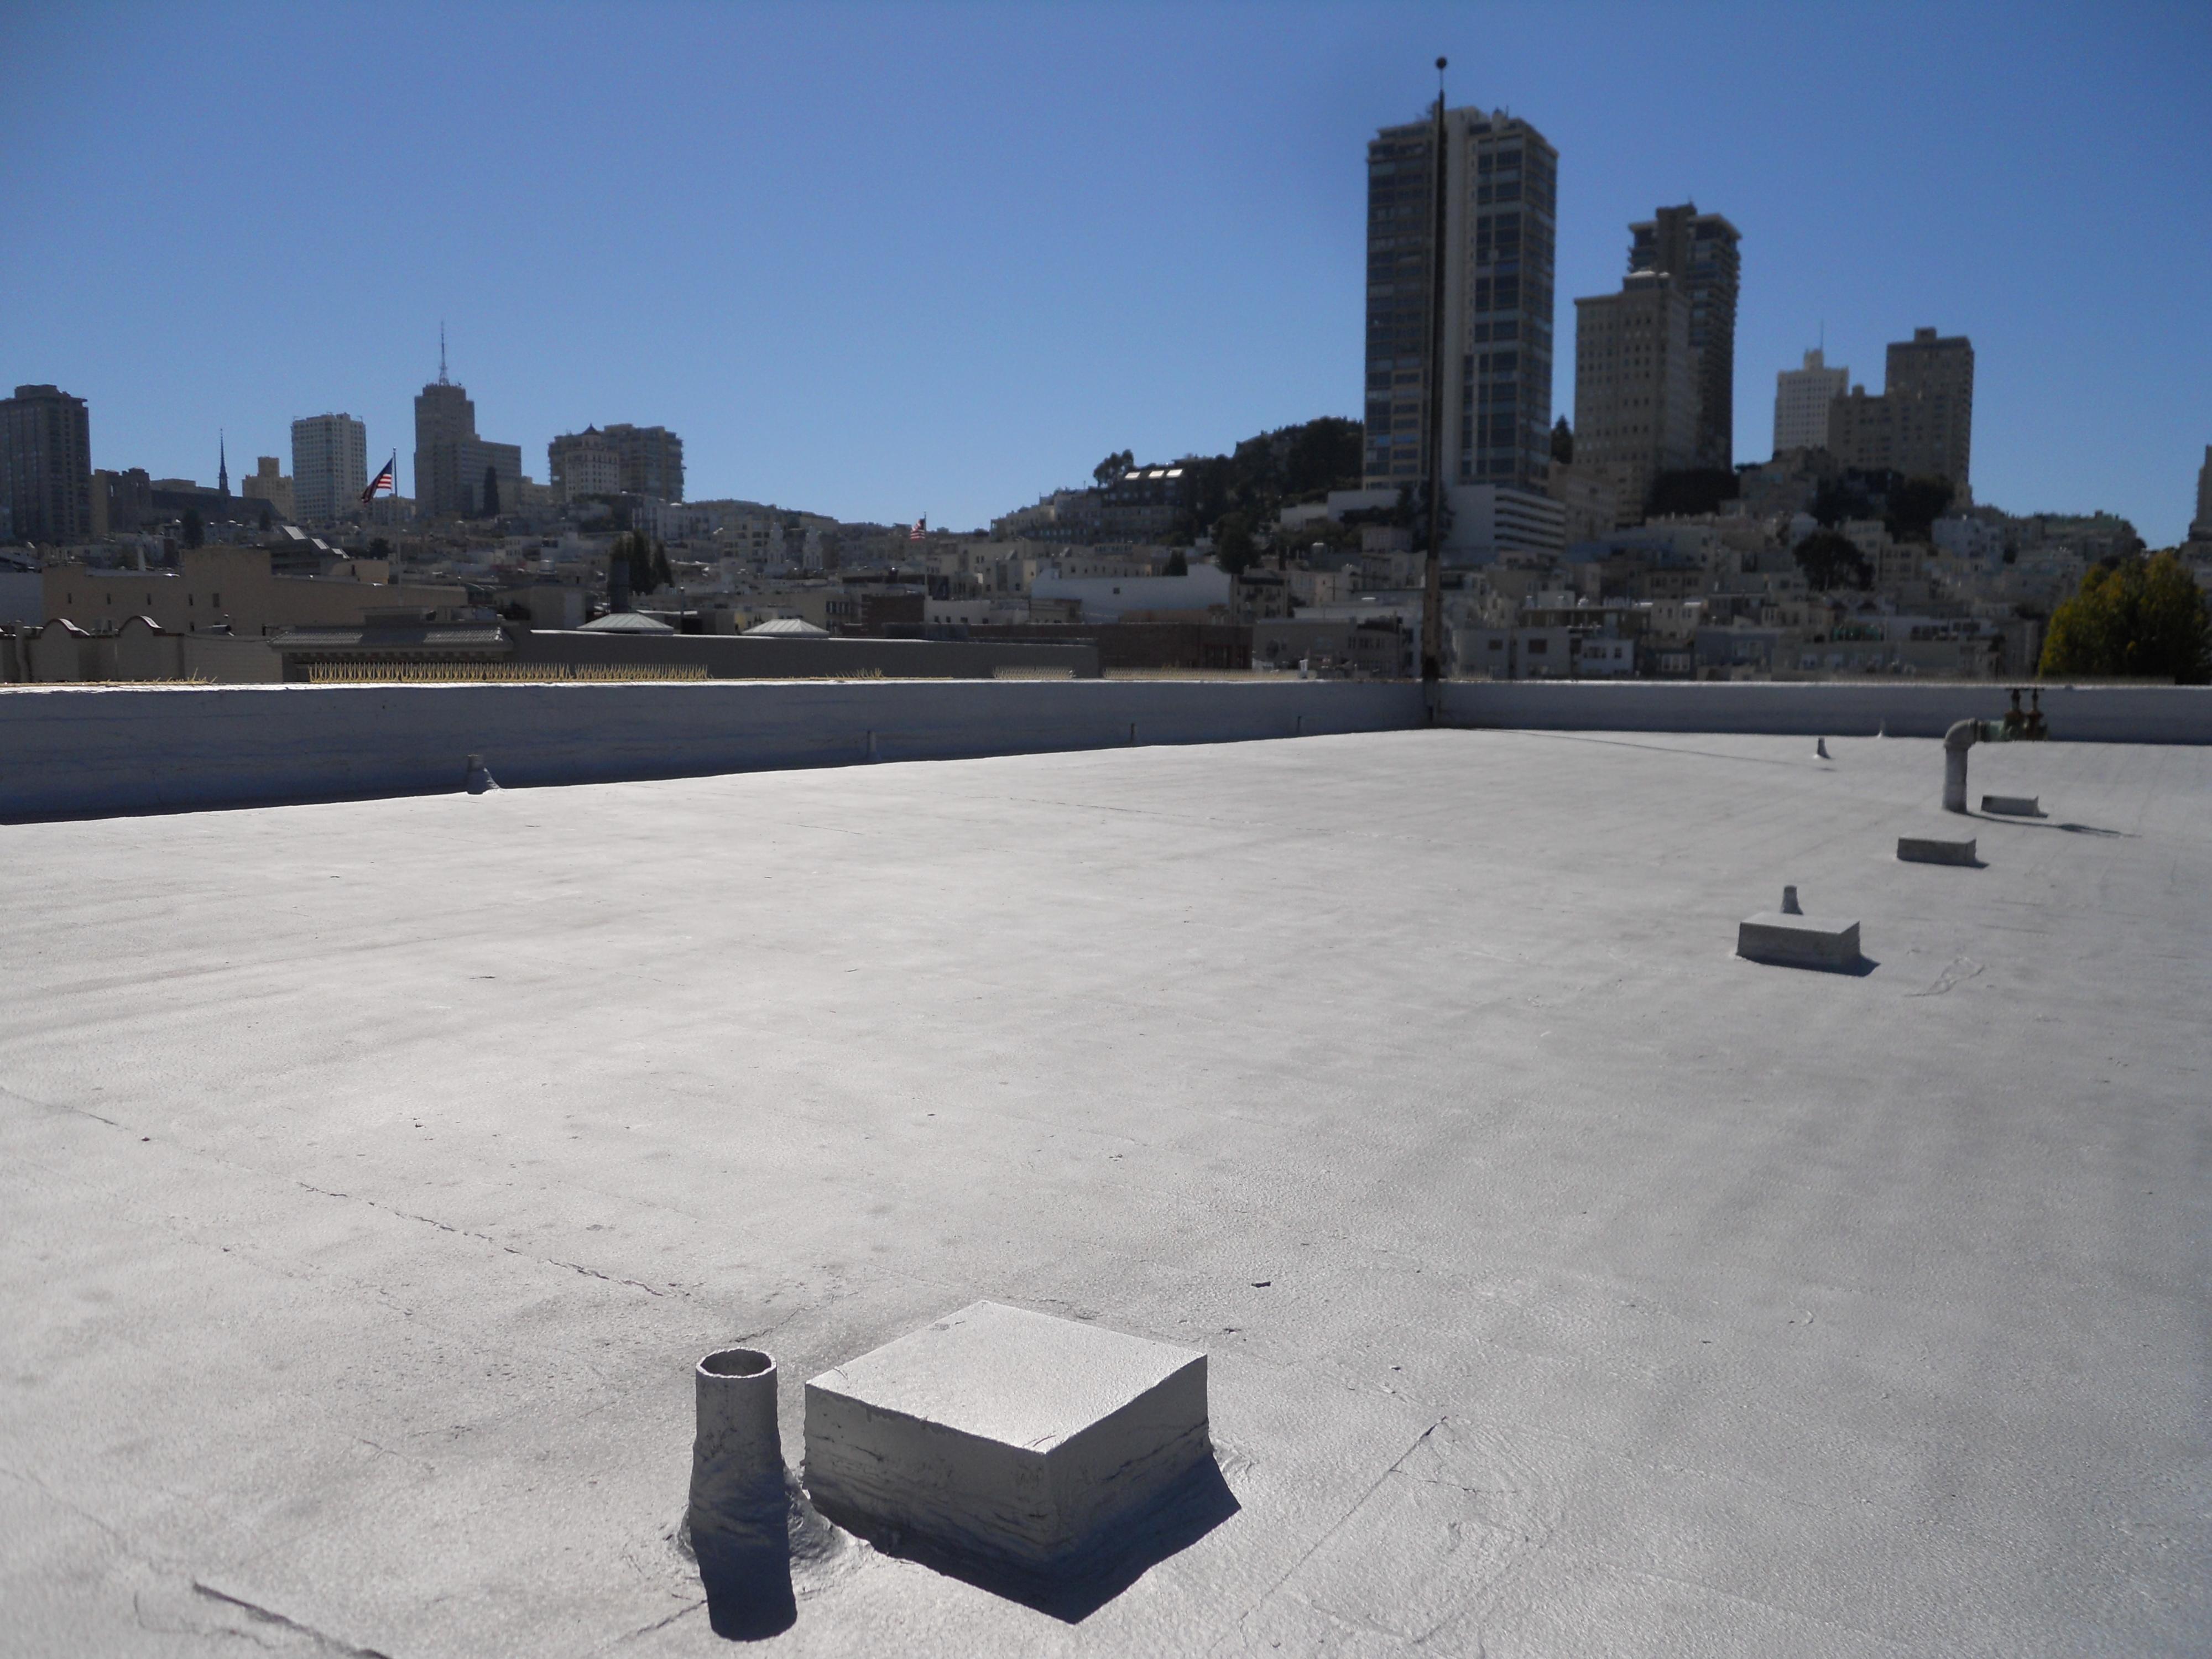 High Resolution Wallpaper | Rooftop 4000x3000 px